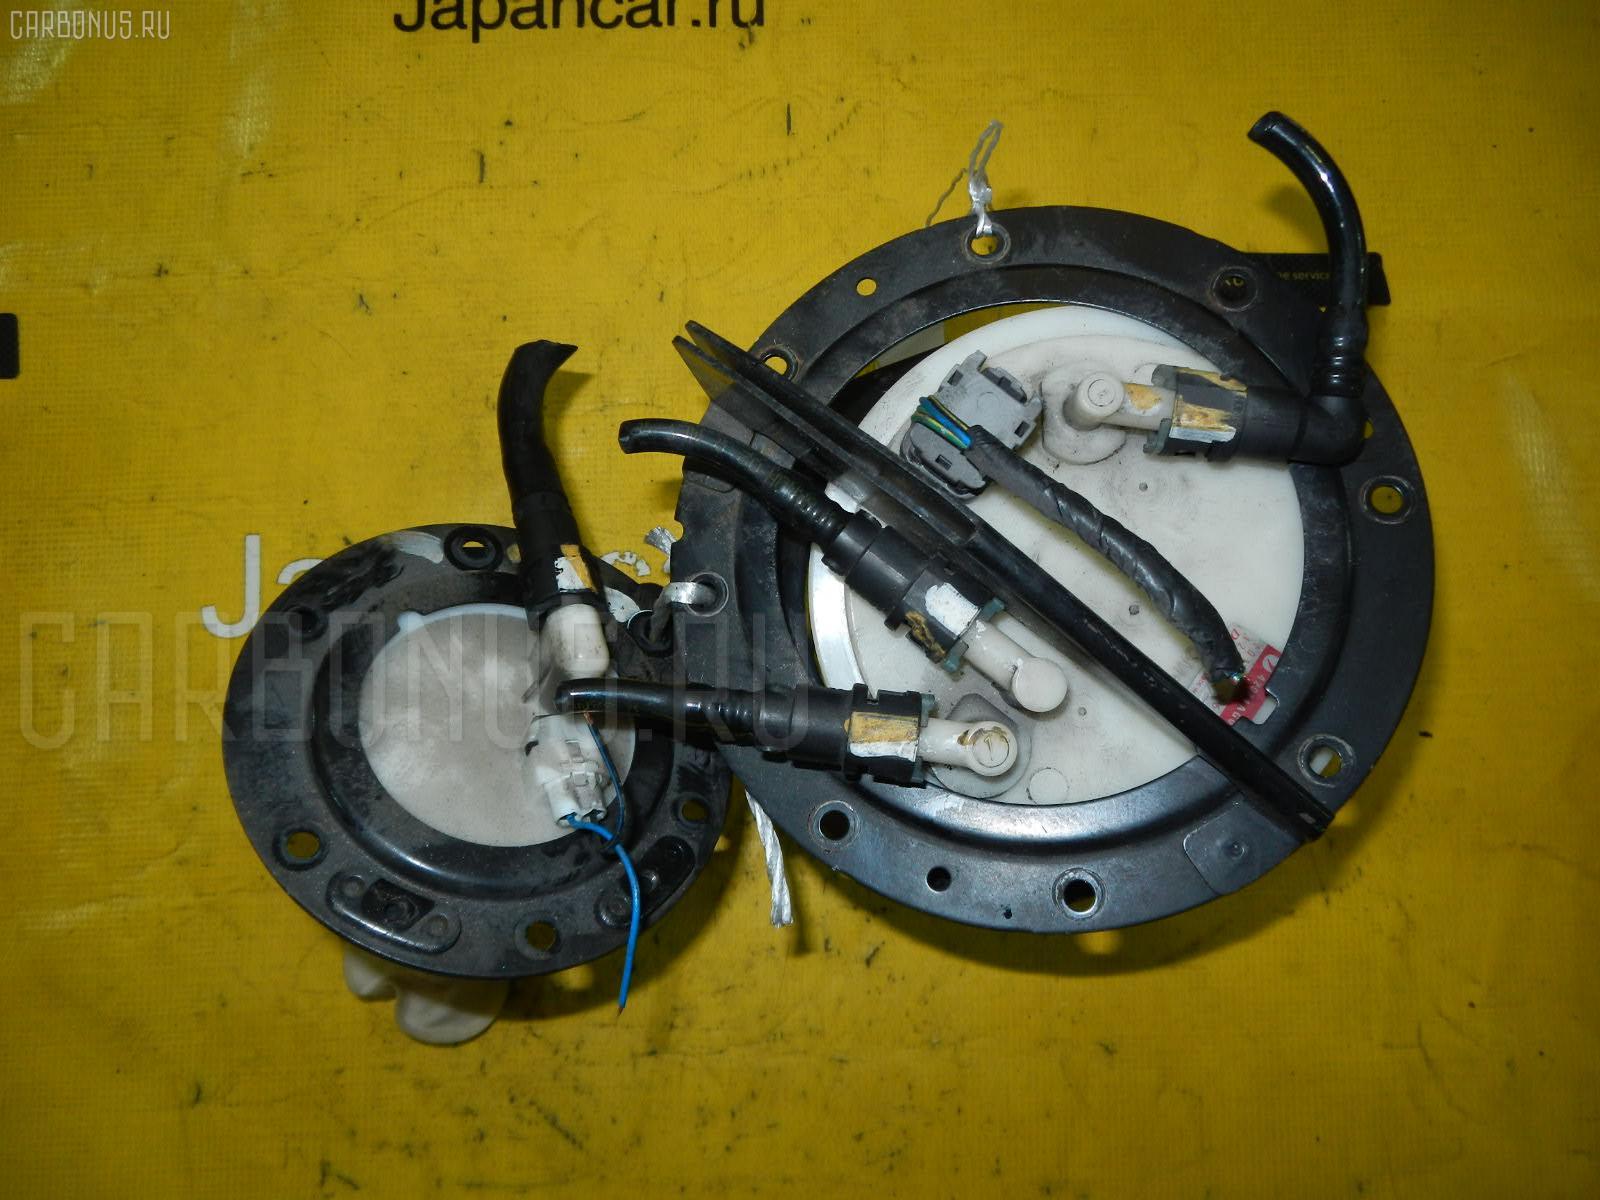 Бензонасос SUBARU LEGACY WAGON BP5 EJ20-TT Фото 2